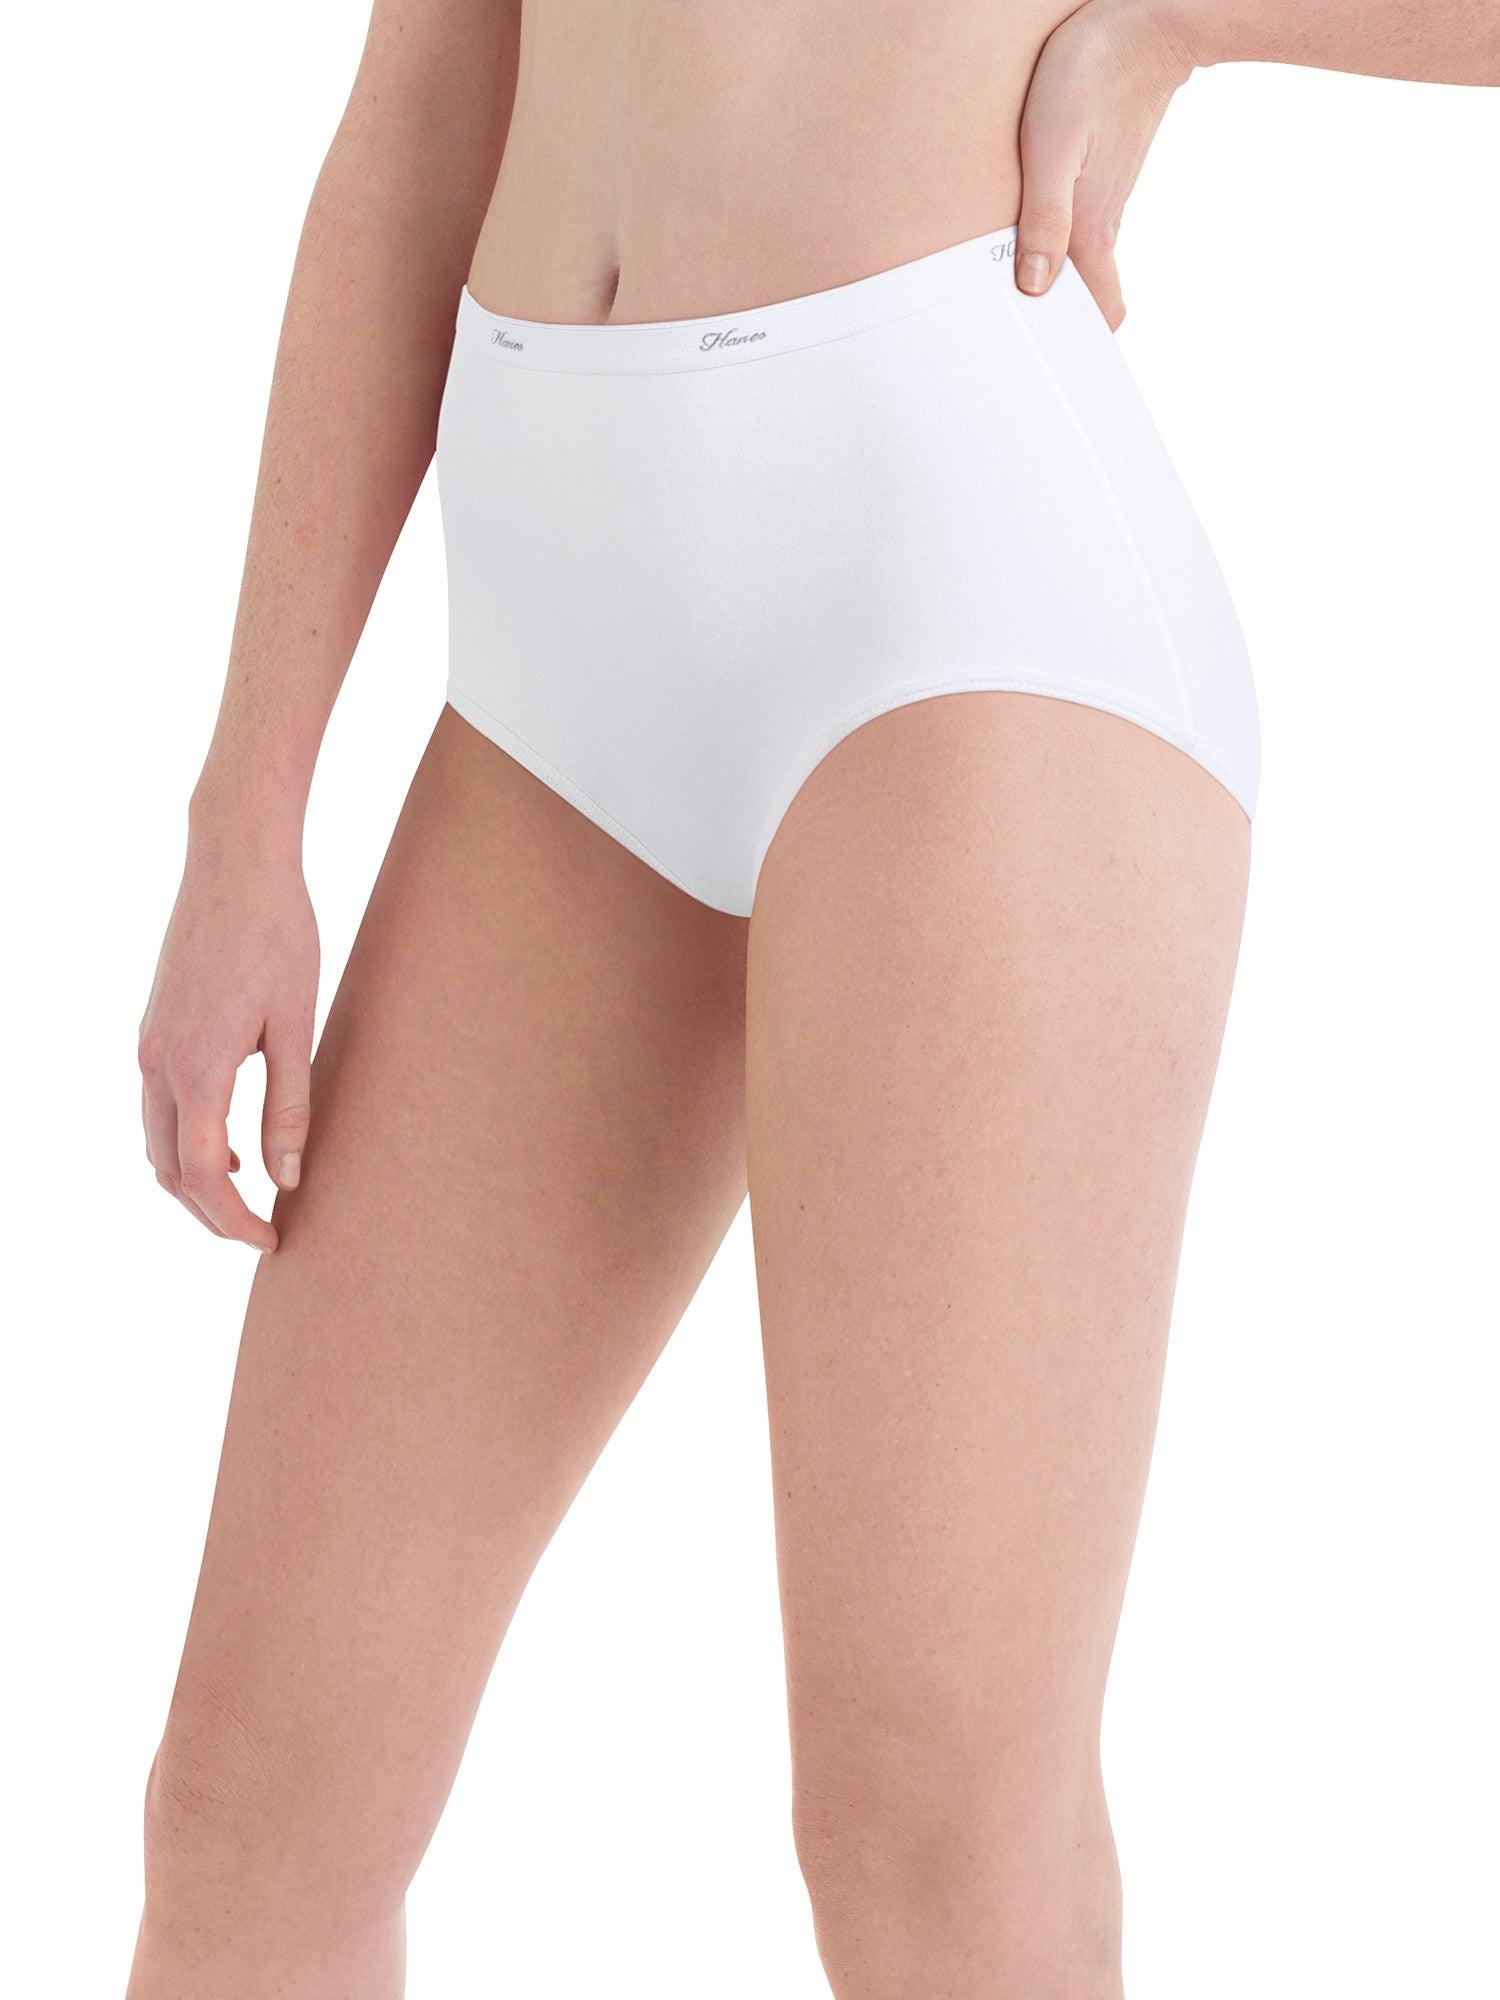 Hanes Cotton Sporty Hipsters Underwear Panties No Pinch Multi Color U PICK Size